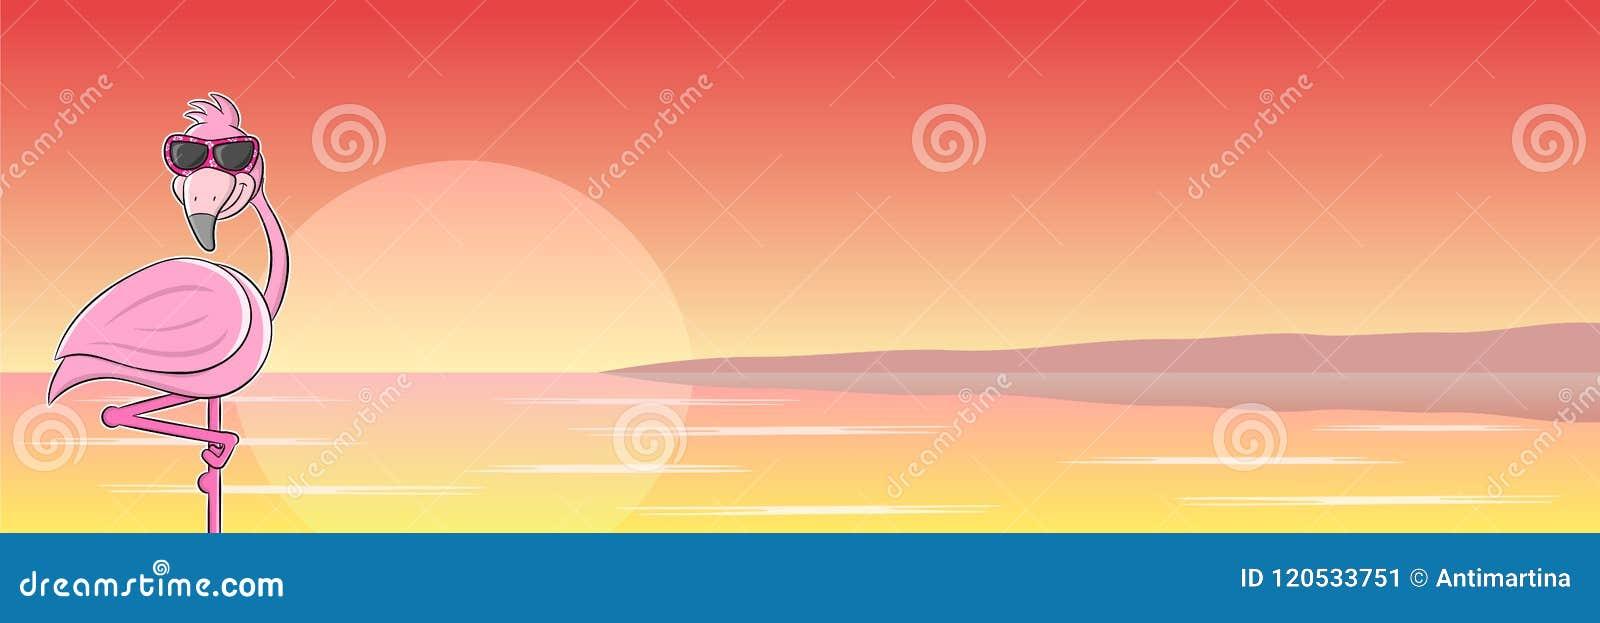 be115212da73 Vector illustration of a cartoon flamingo with sunglasses. More similar  stock illustrations